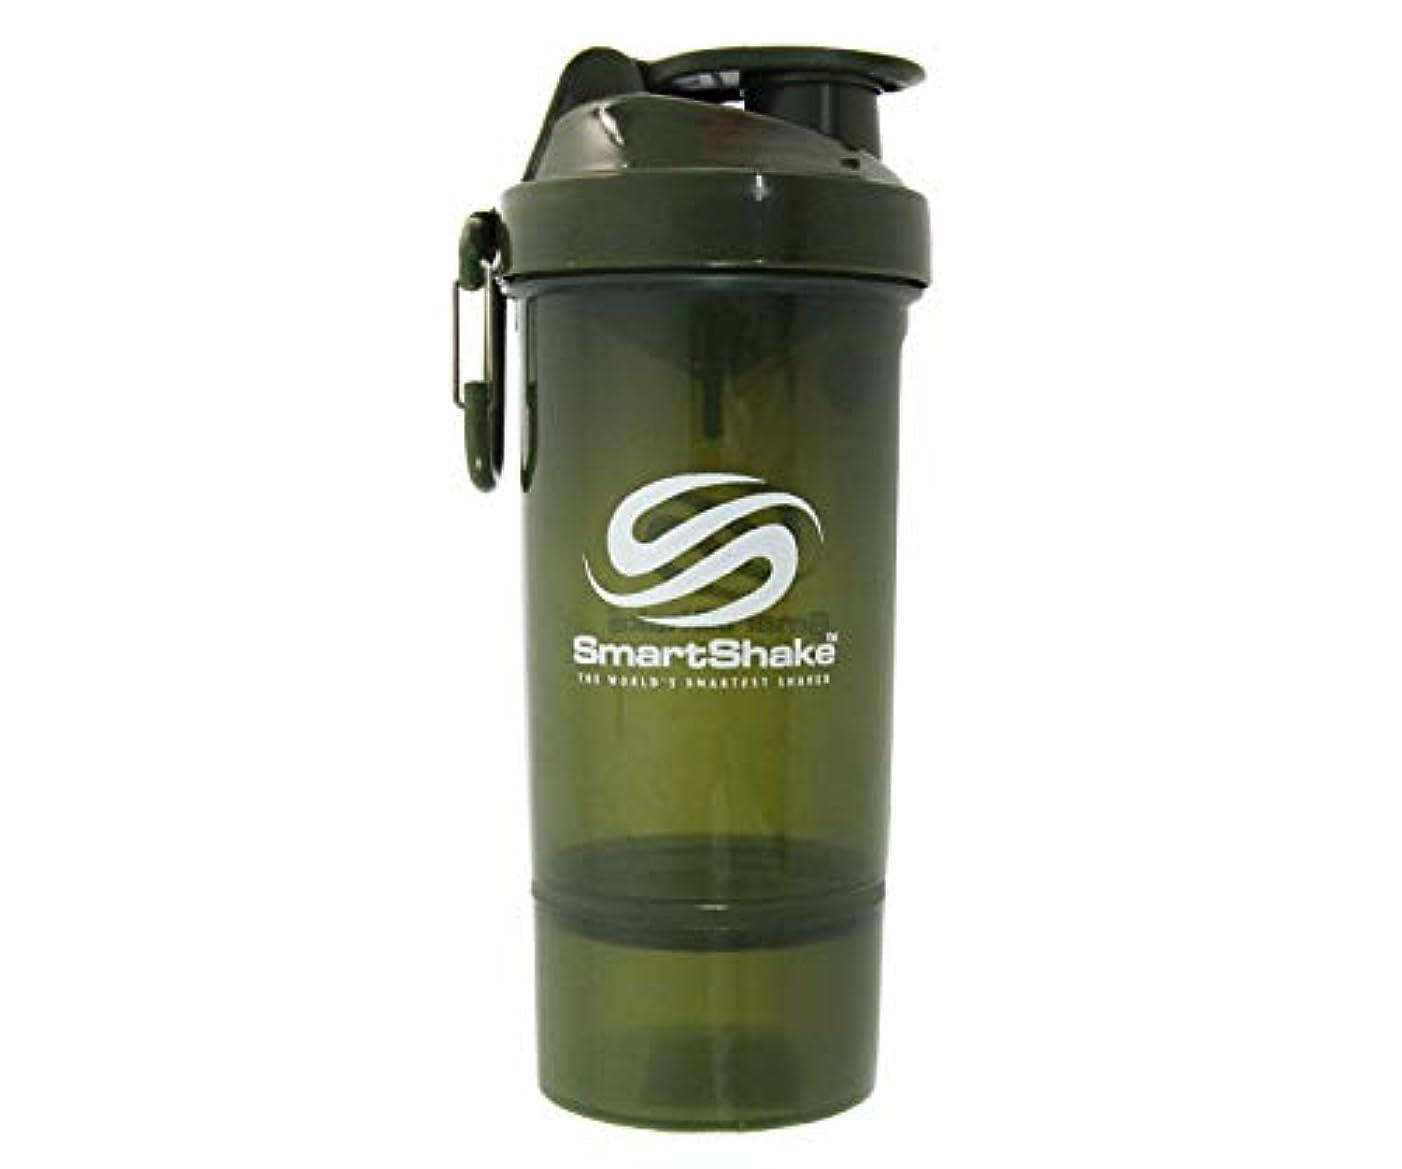 SmartShake(スマートシェイク) SmartShake ORIGINAL2GO ONE 800ml Army Green 多機能プロテインシェイカー アーミーグリーン 800ml大容量 コンテナ1段タイプ